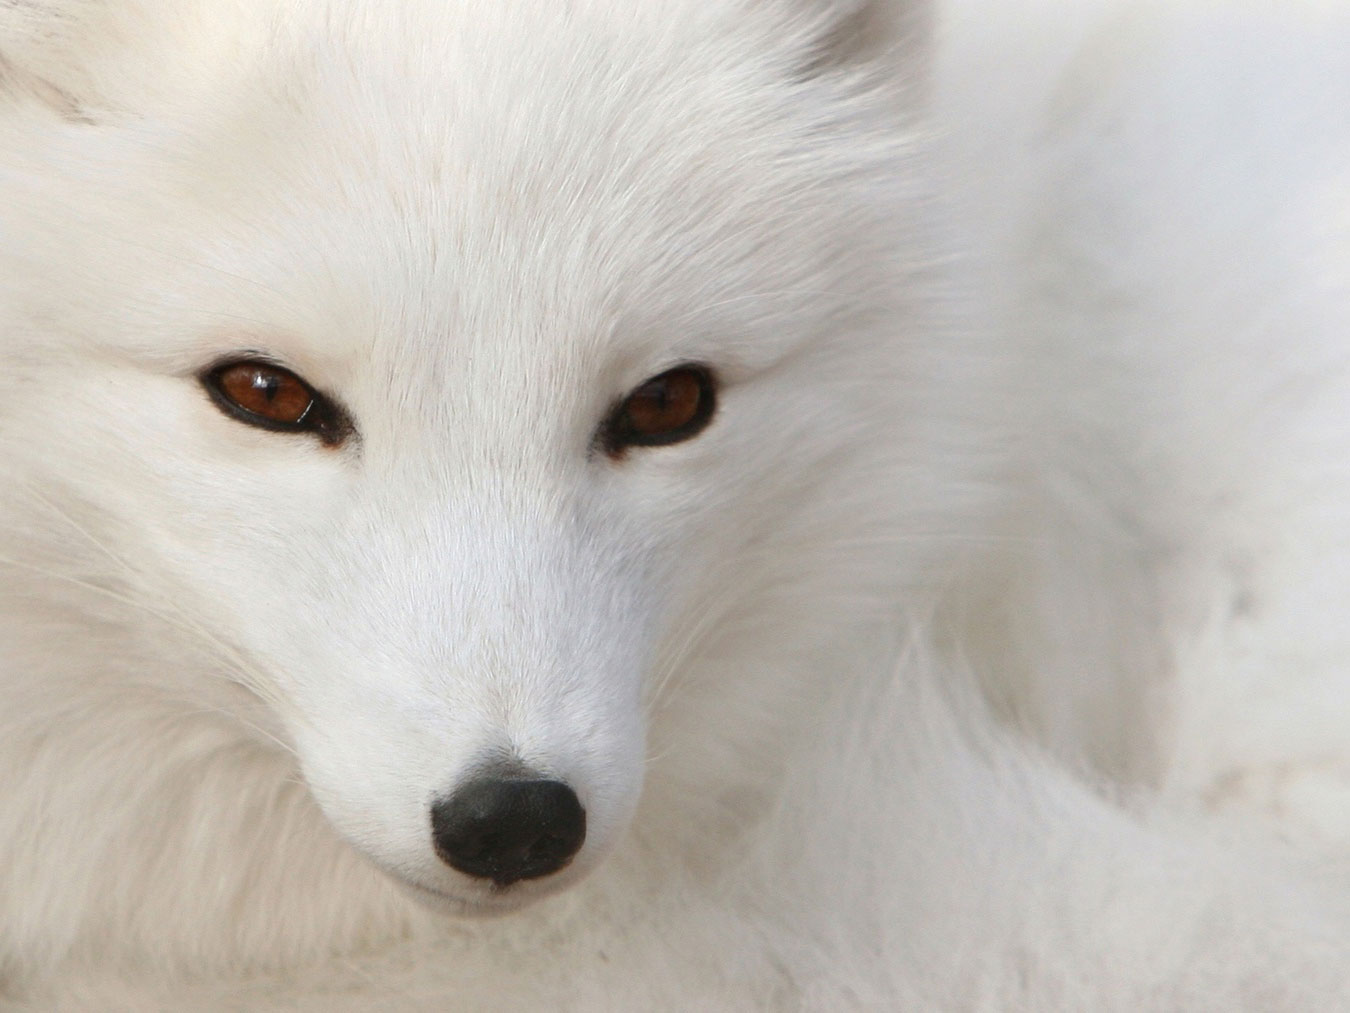 http://3.bp.blogspot.com/-707-1O534SI/TkeaTl9DU5I/AAAAAAAA1ew/RHNHCtftWoI/s1600/White_Polar_Silver_Fox.jpg